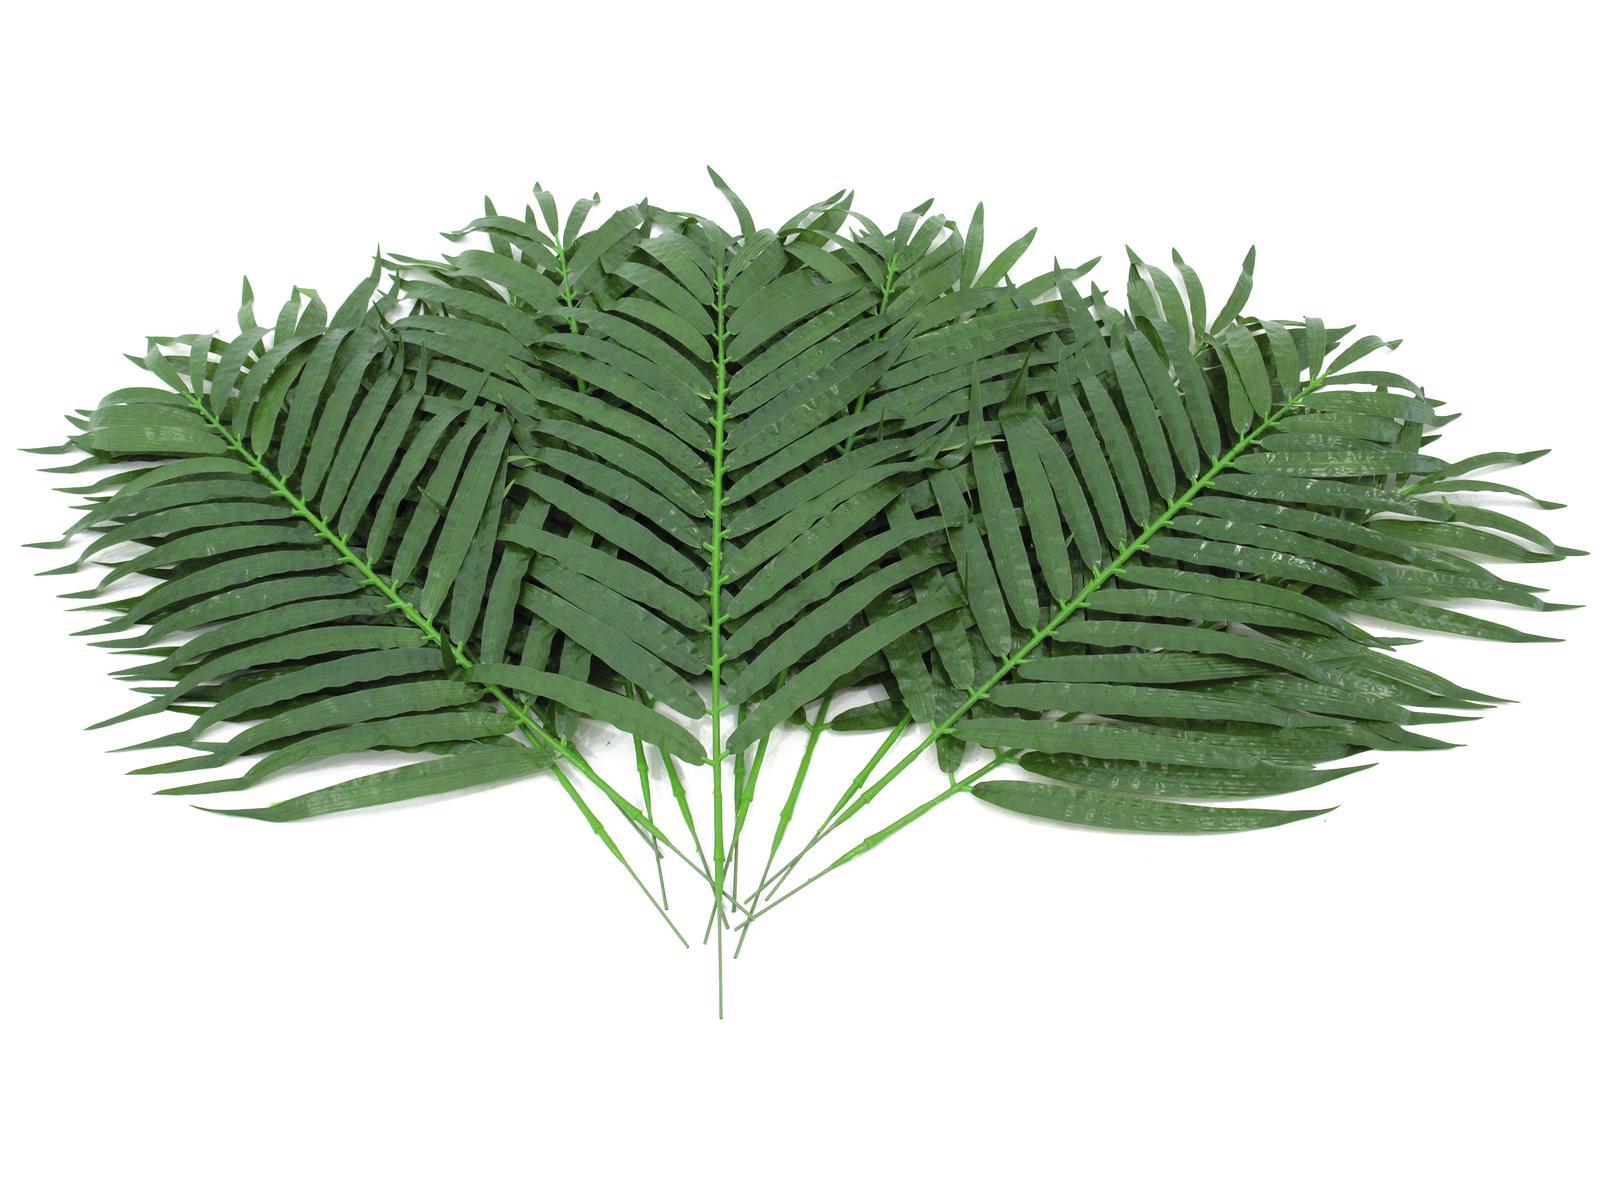 EUROPALMS Kokos-Palmwedel, künstlich, 80cm 12x